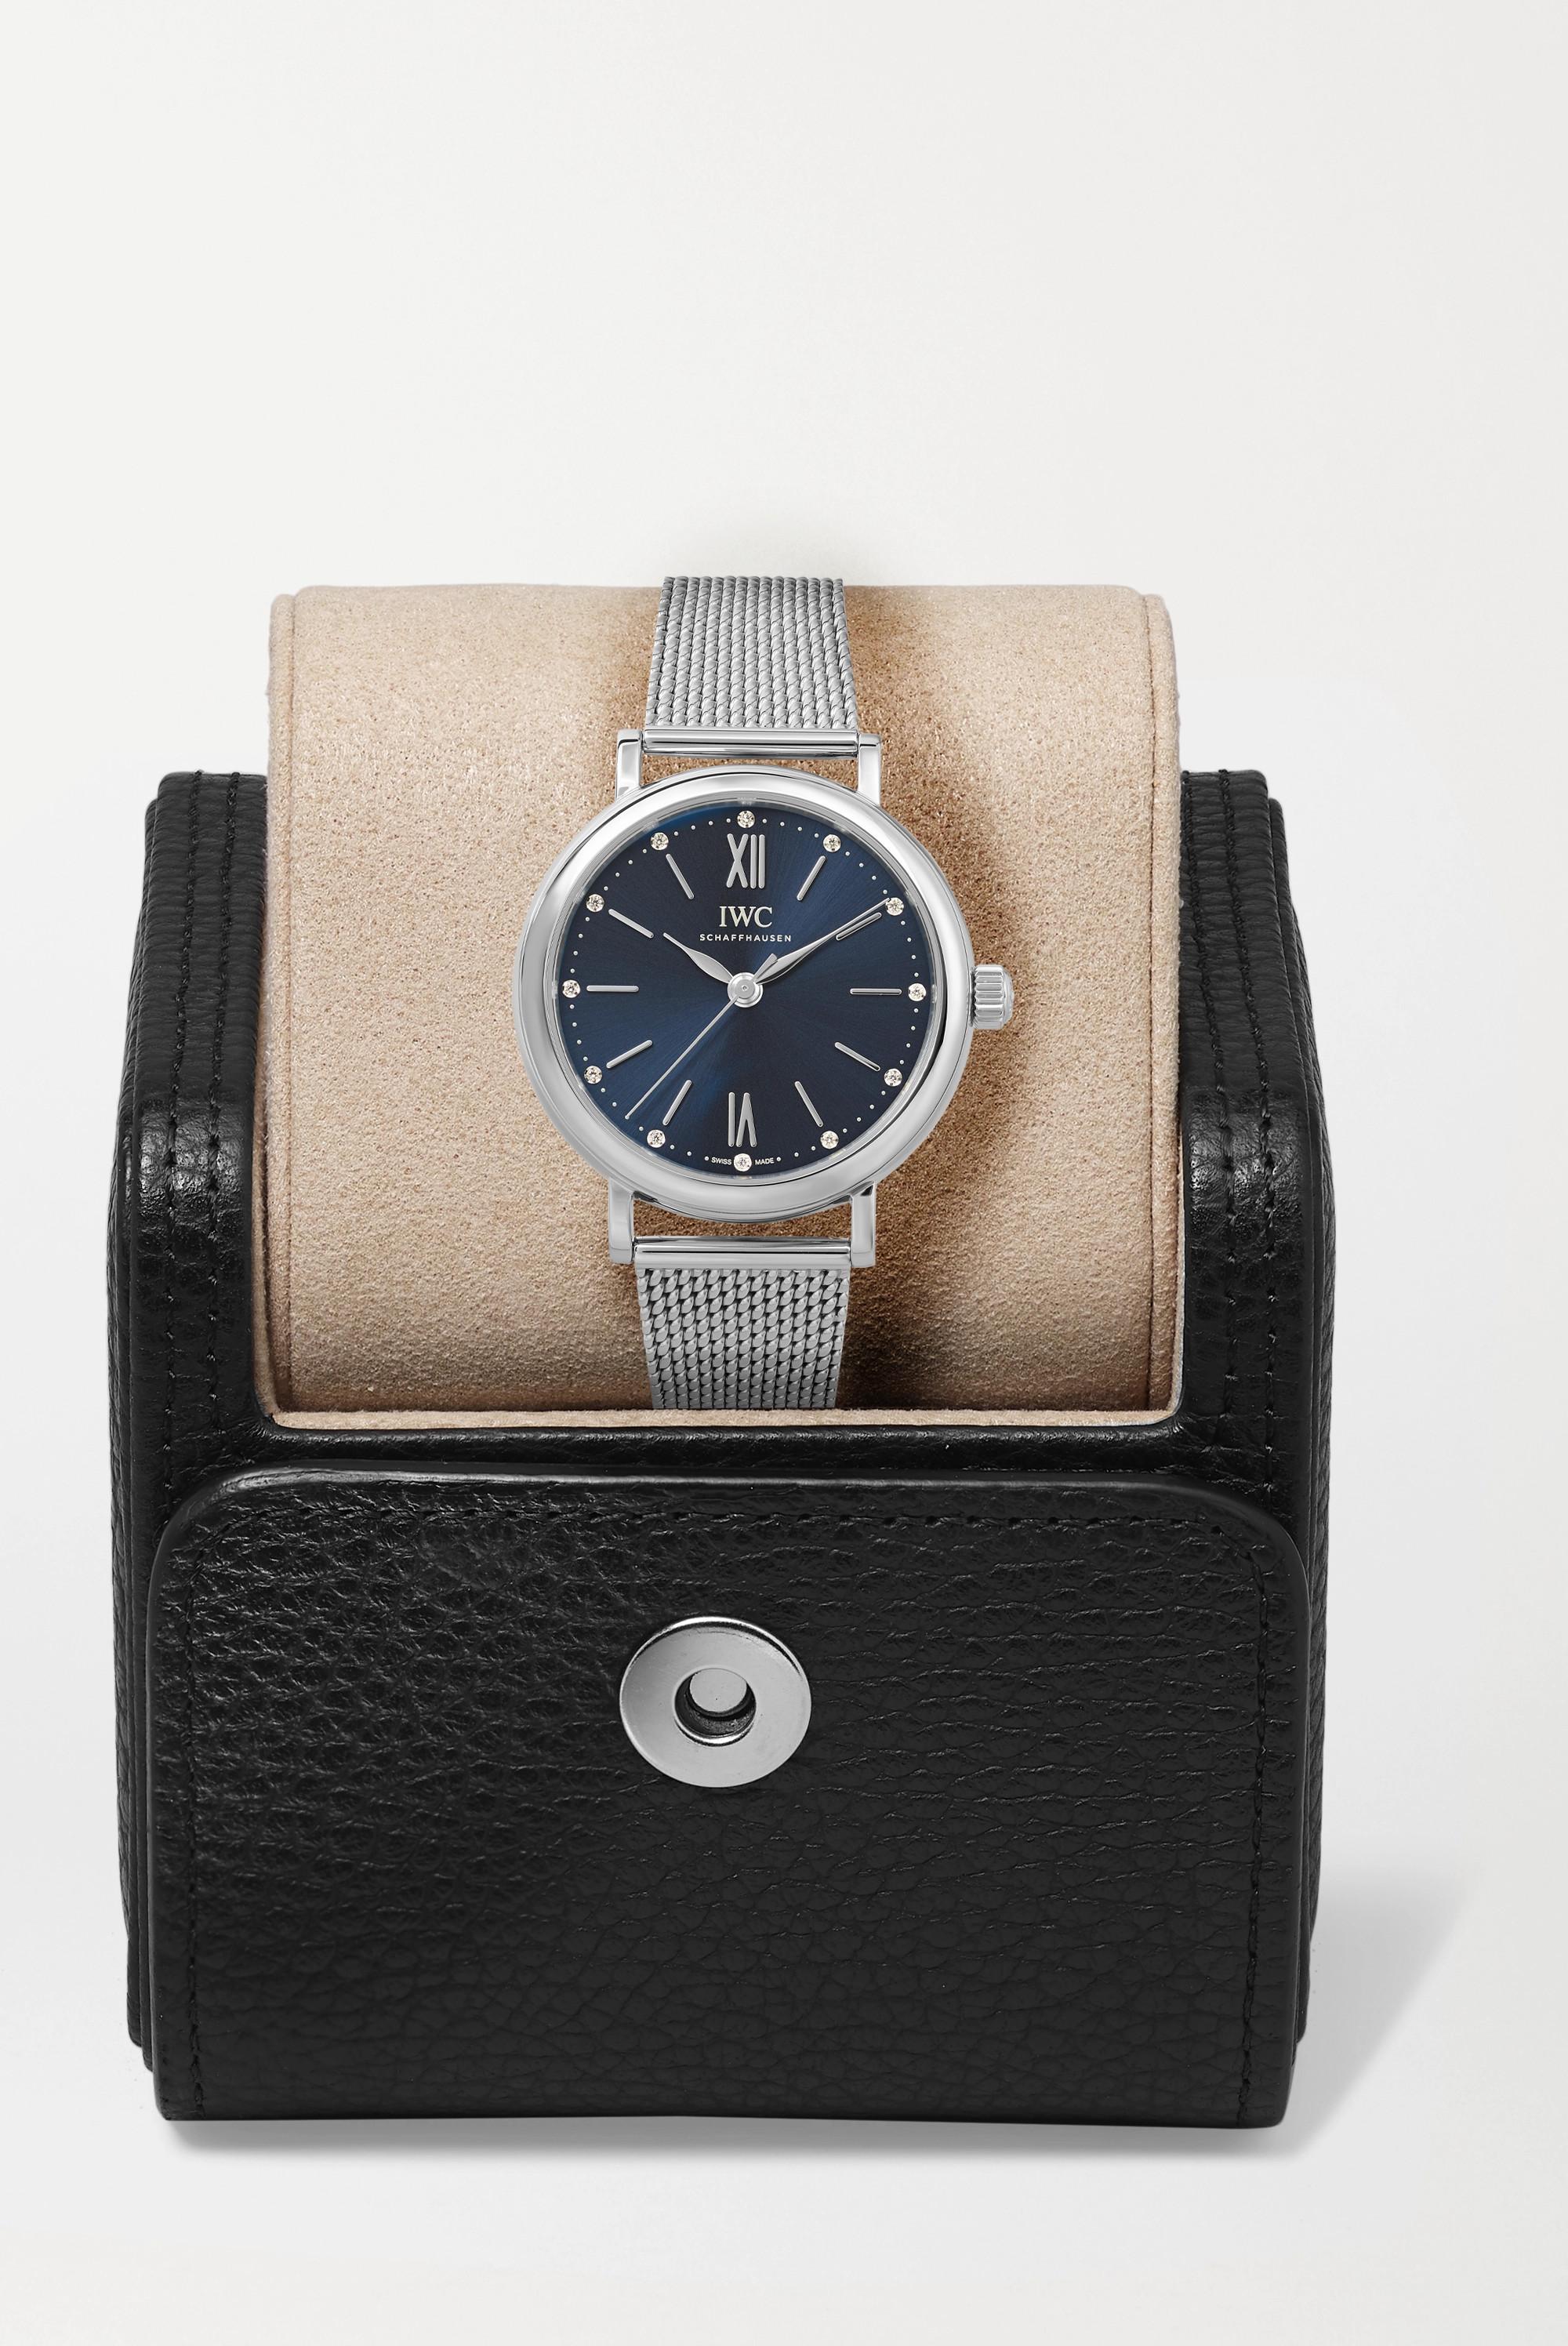 IWC SCHAFFHAUSEN Portofino Automatic 34mm stainless steel and diamond watch